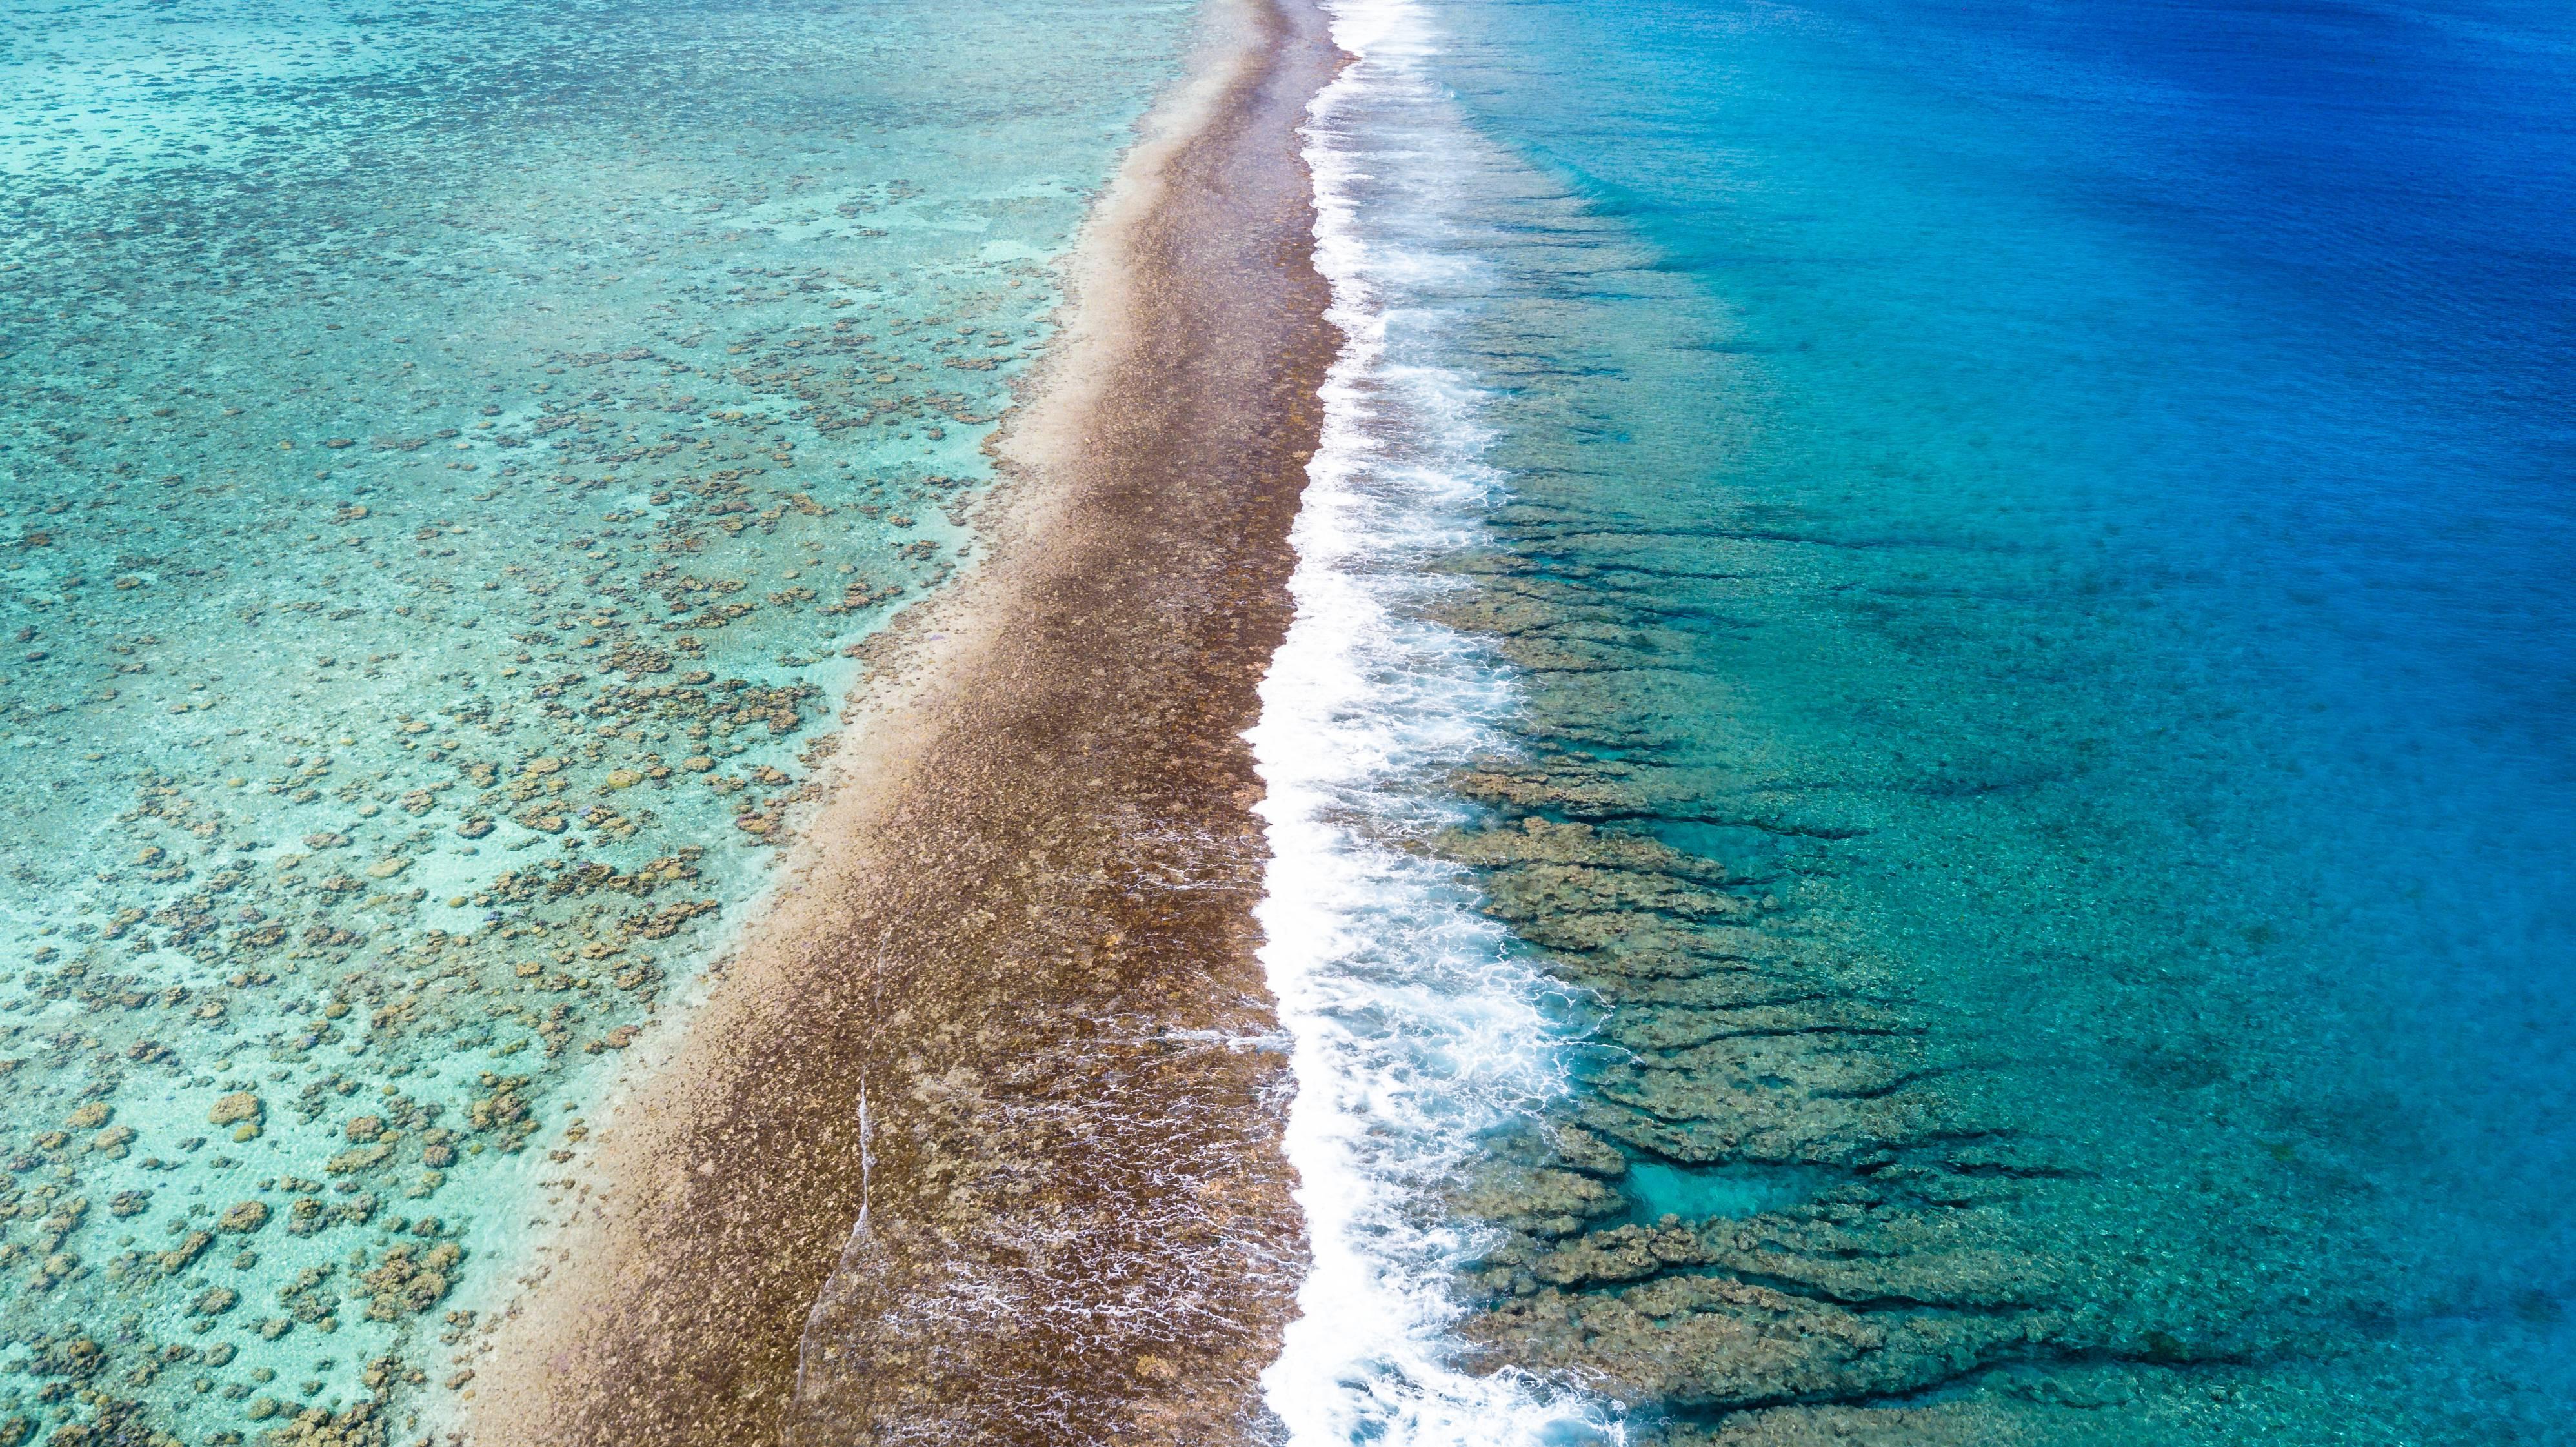 Photo 2: Moorea un paradis sur terre